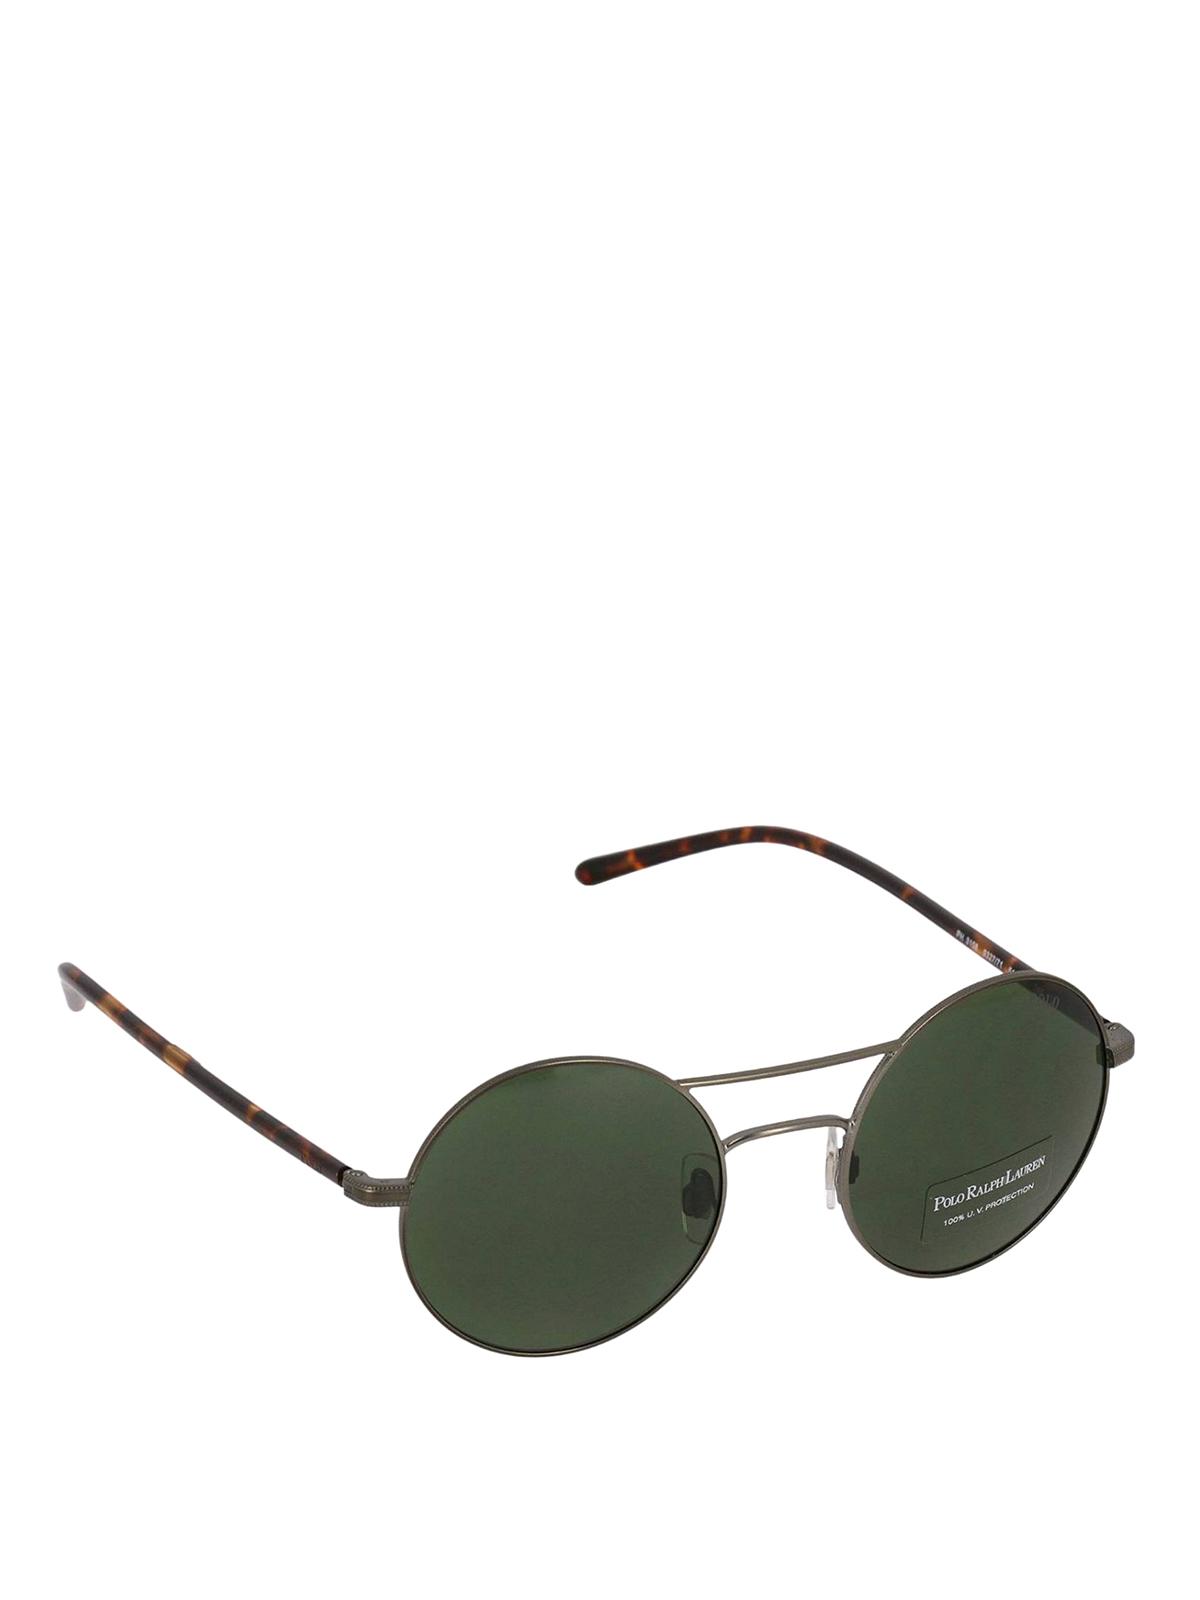 Polo Ralph Lauren Green Round Lenses Double Bridge Sunglasses